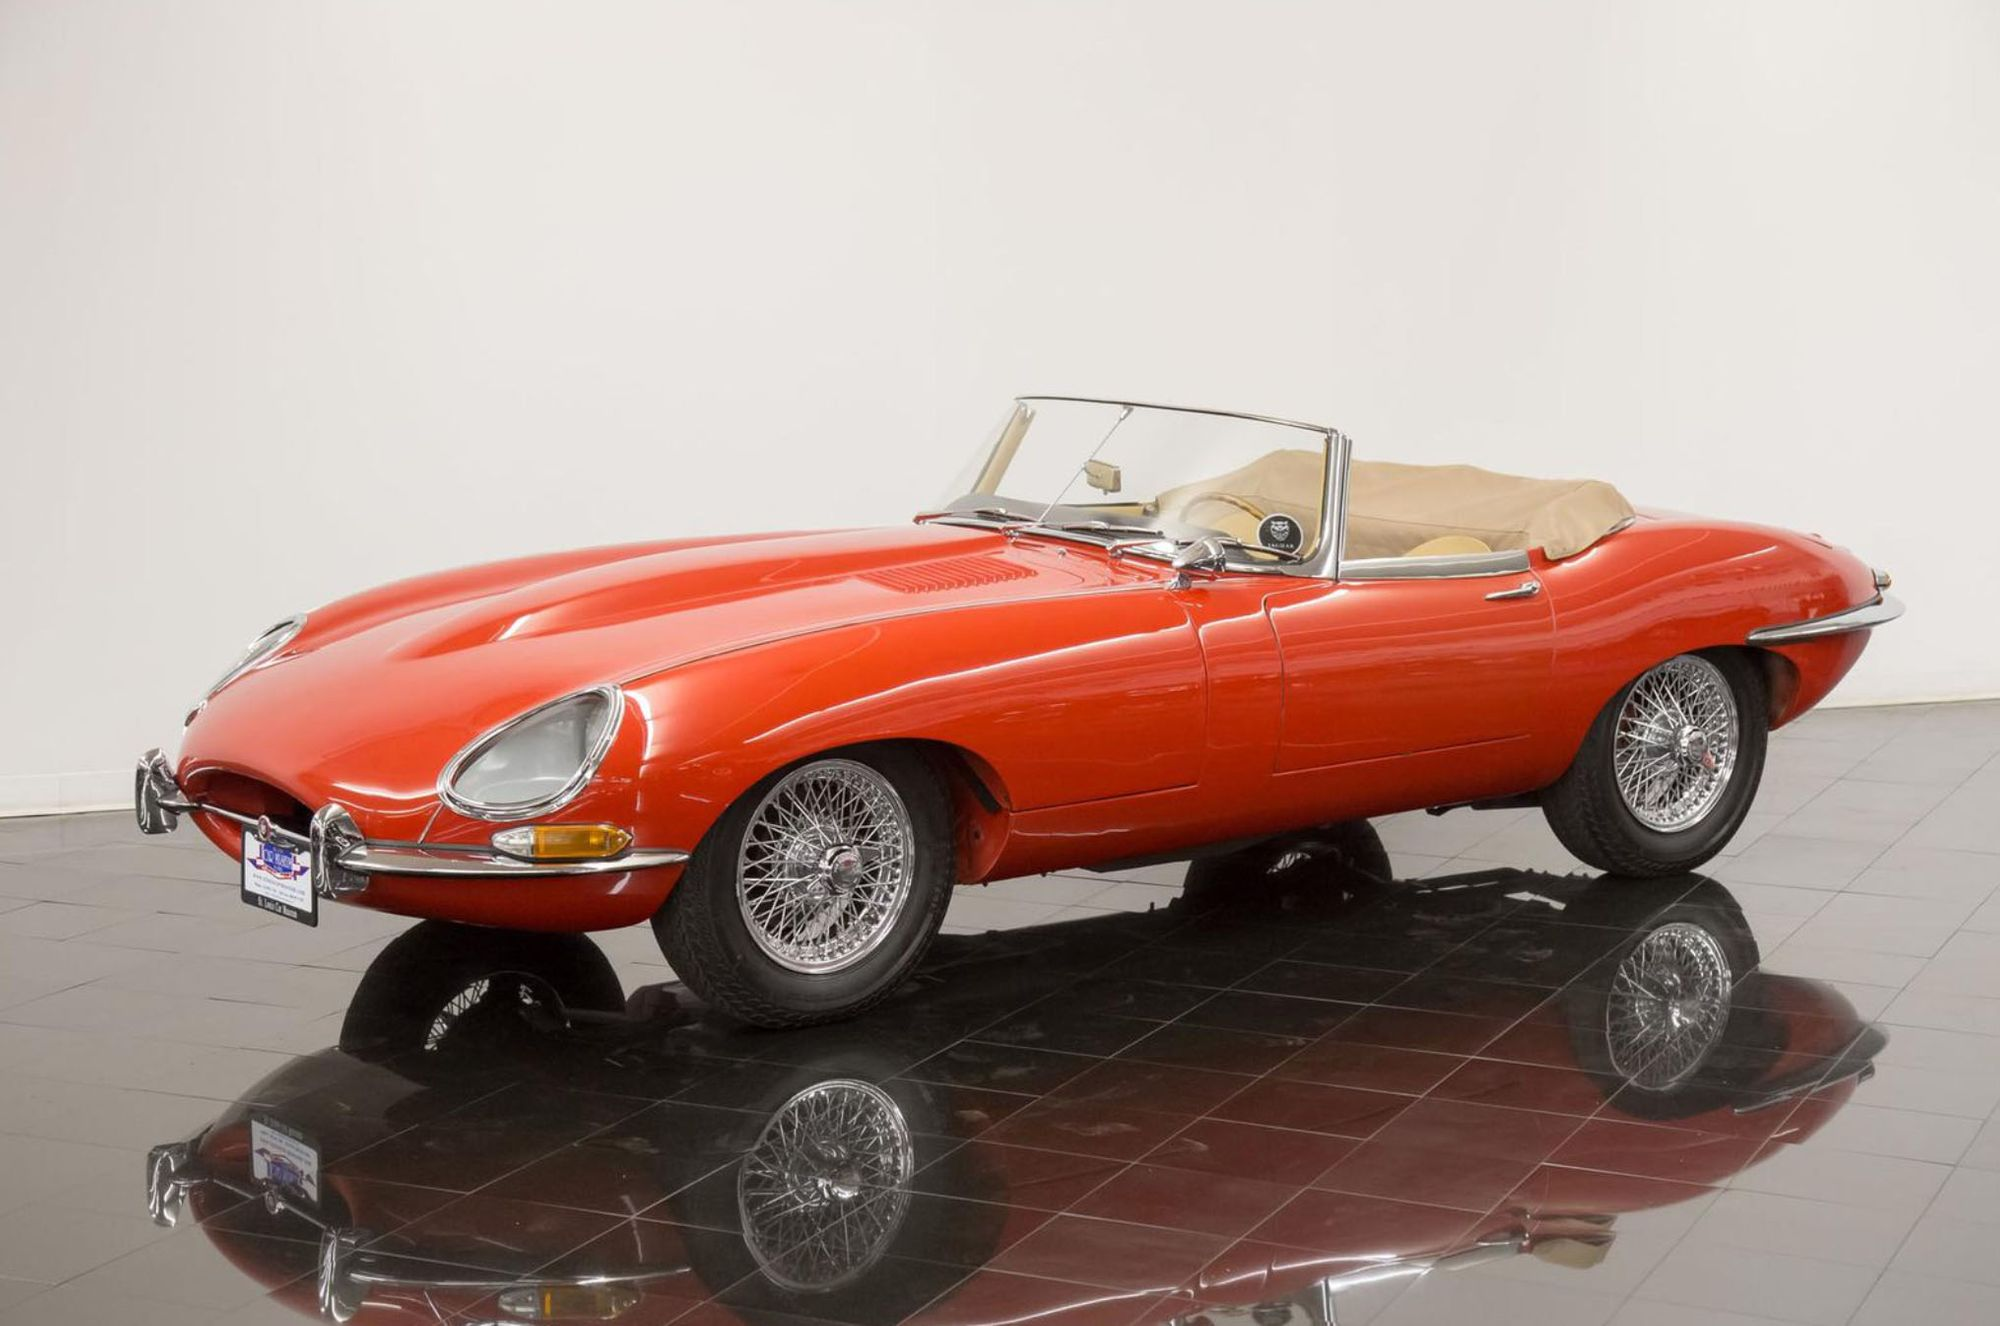 "<img src=""1964-jaguar-xke-e-type.jpg"" alt=""A stunning example of a 1964 Jaguar XKE E-Type Convertible"">"